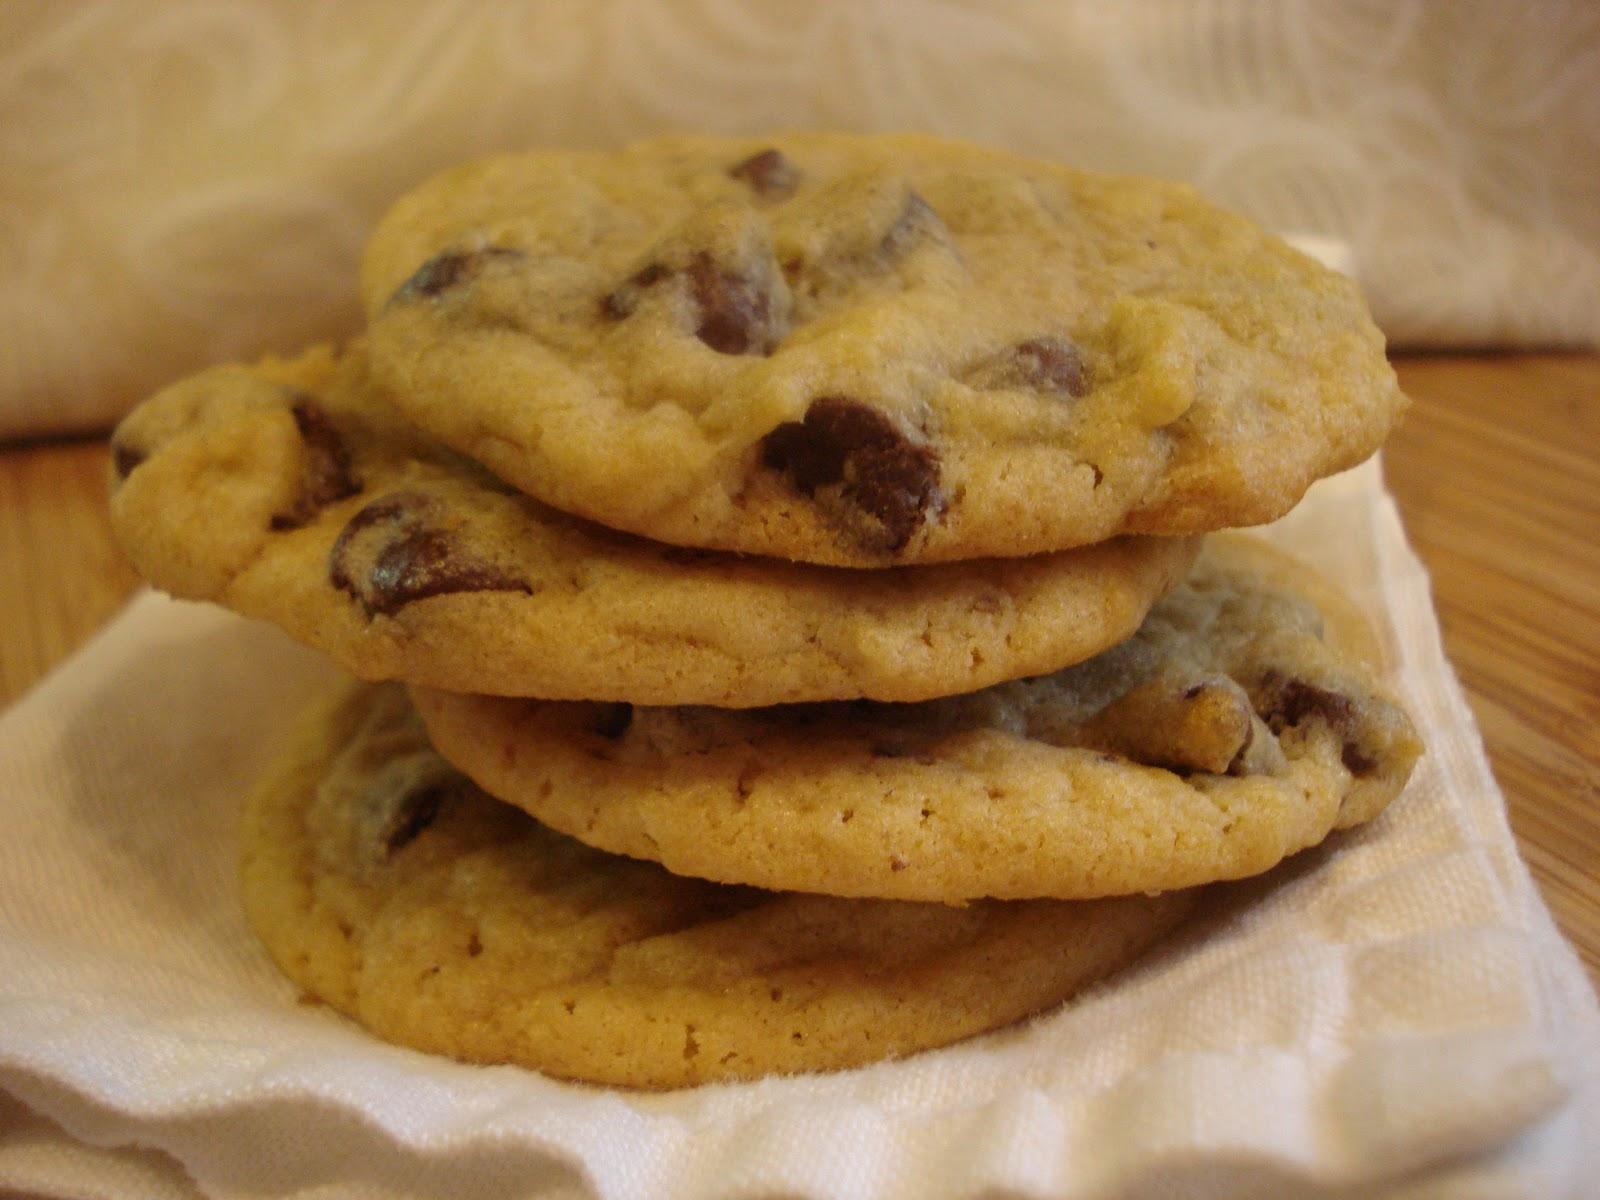 The Cookie Scoop Chocolate Chip Malted Milk Cookies